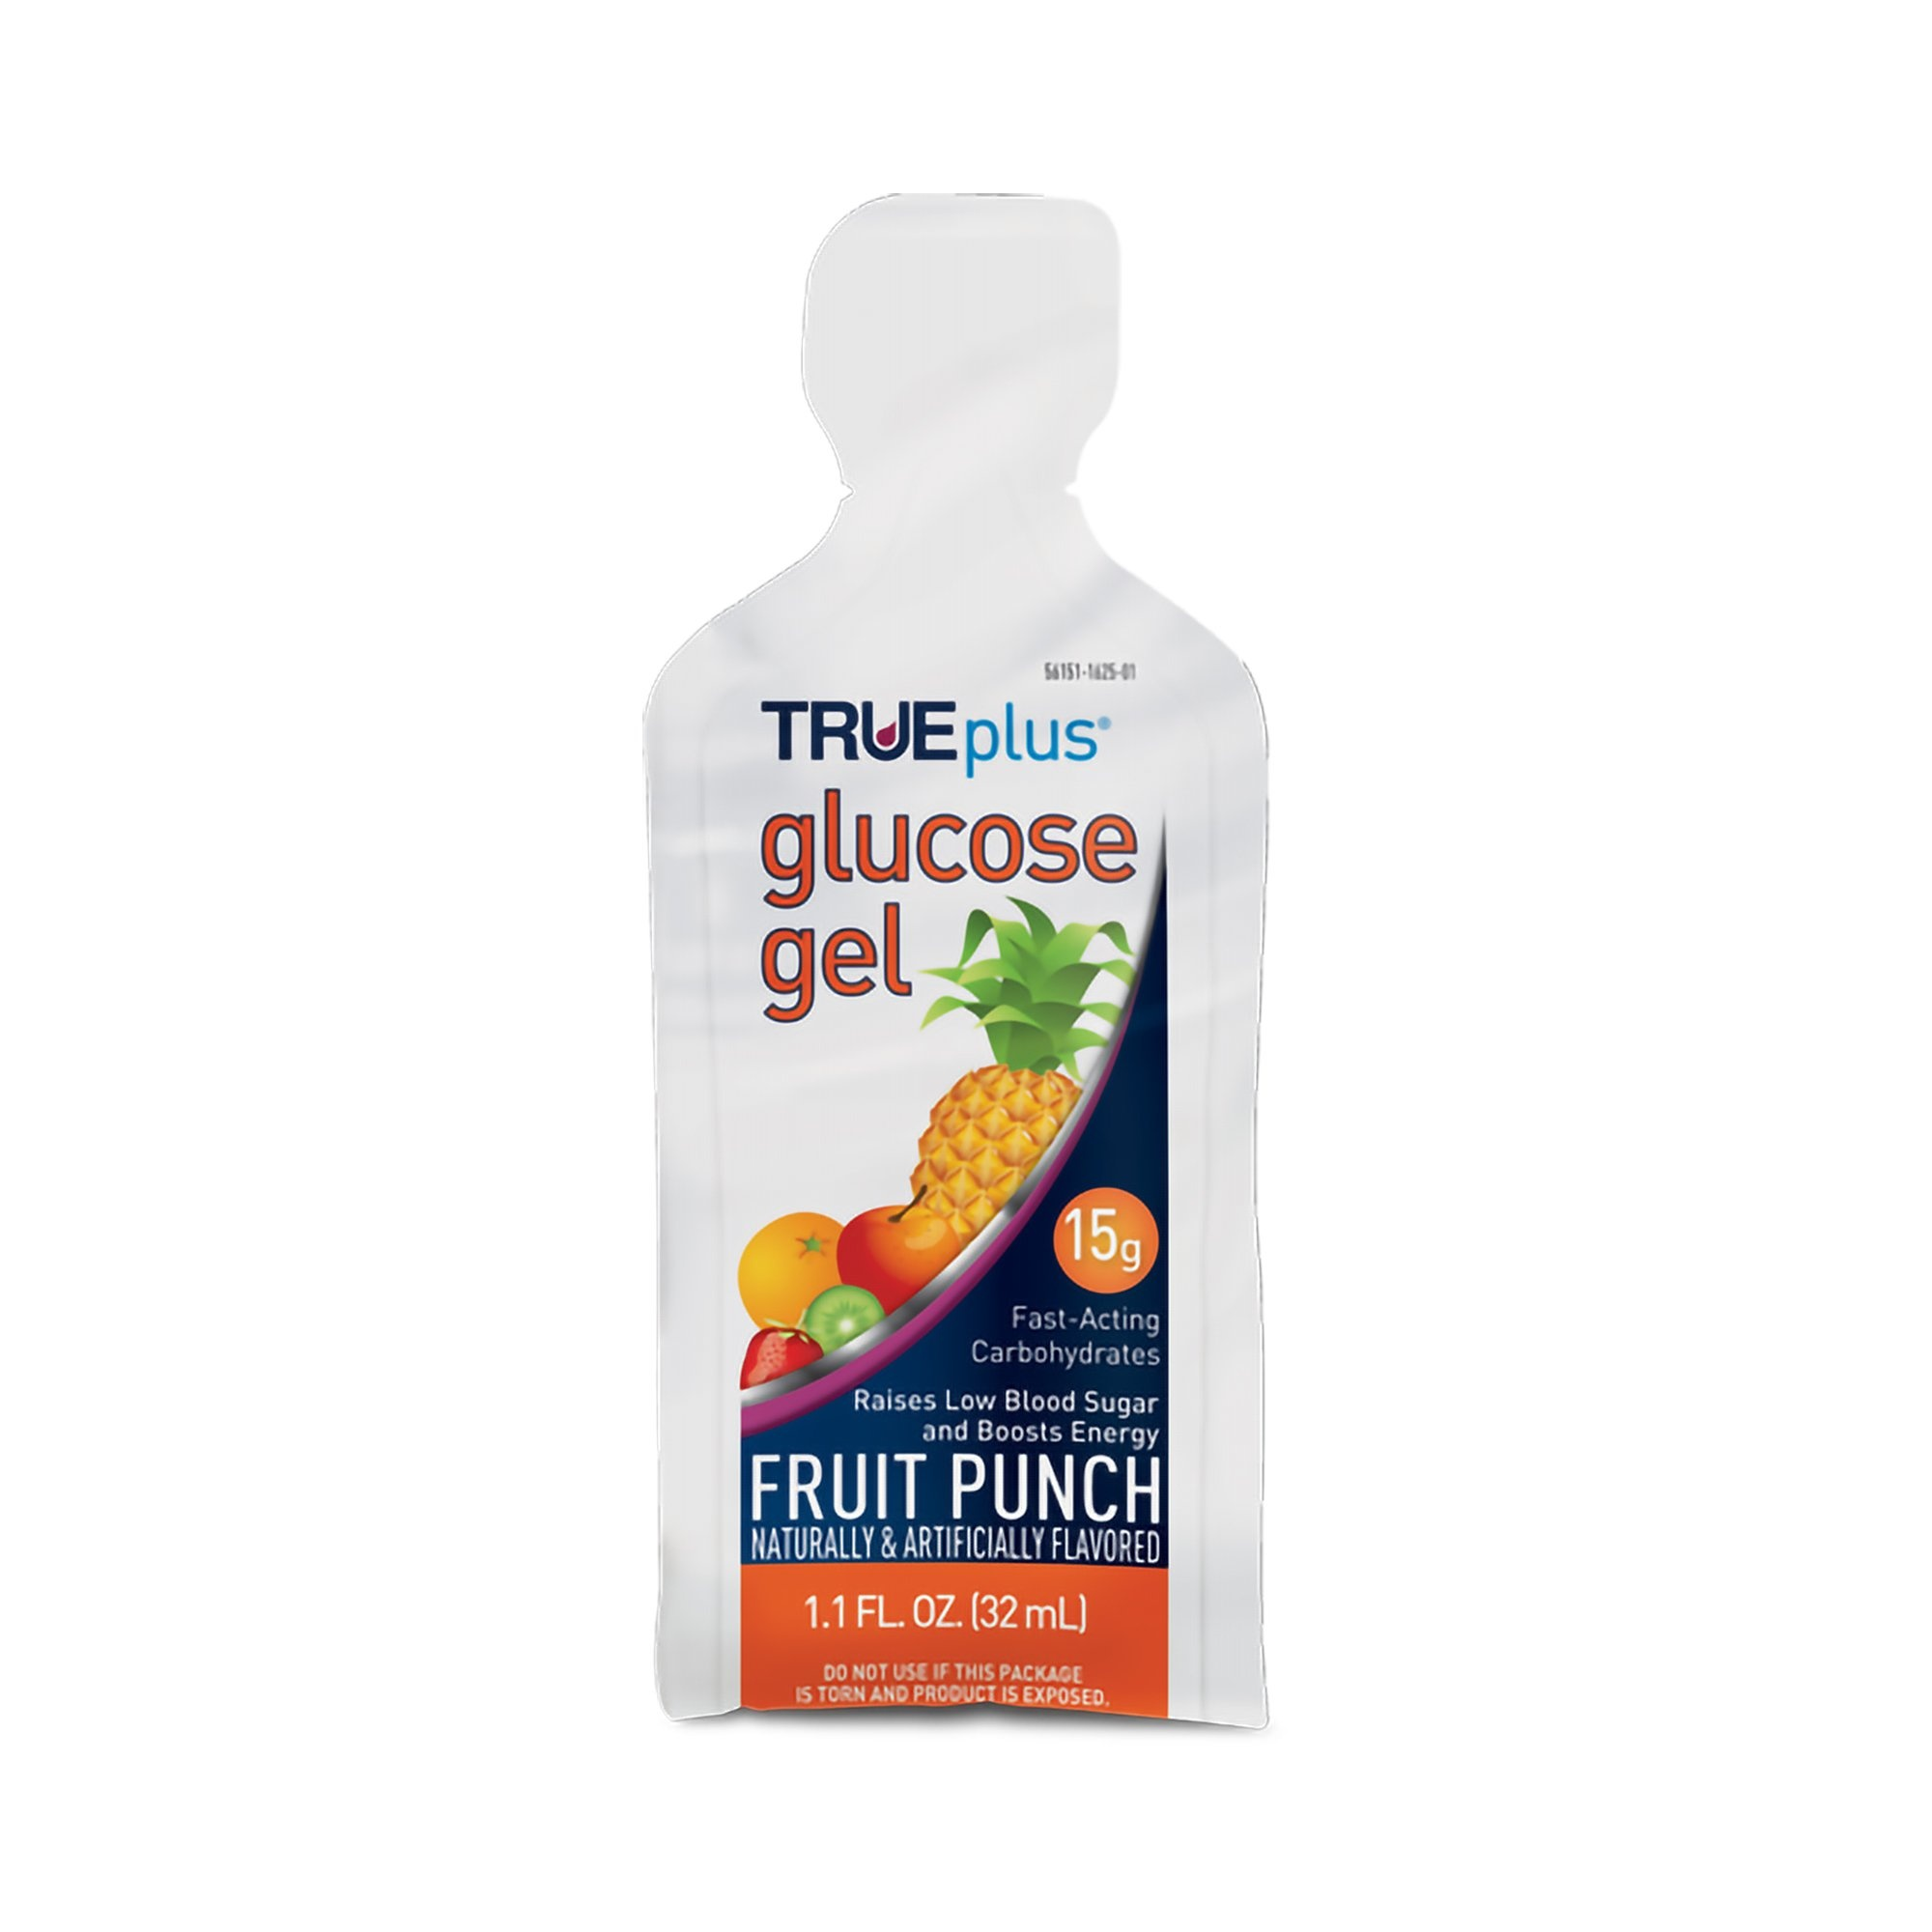 TRUEplus Glucose Gel, Fruit Punch, 1.1 oz., P2H01FP-01, Pack of 6